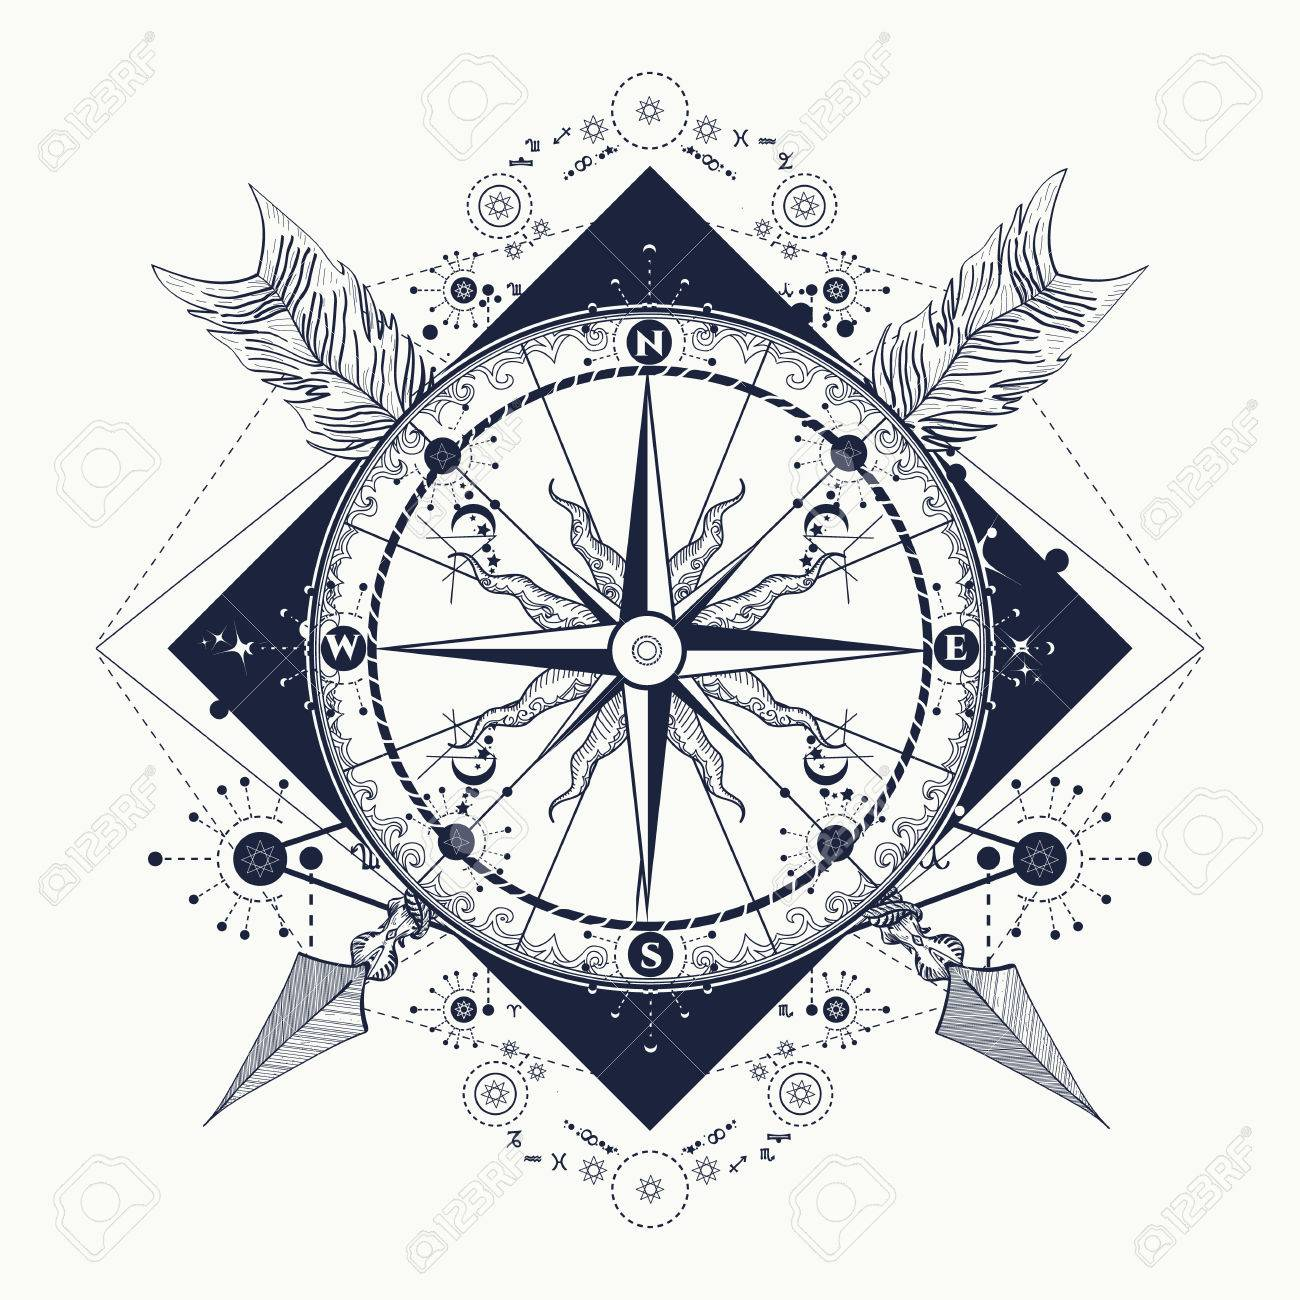 Brújula Y Flechas Cruzadas Arte Del Tatuaje Símbolo Del Turismo